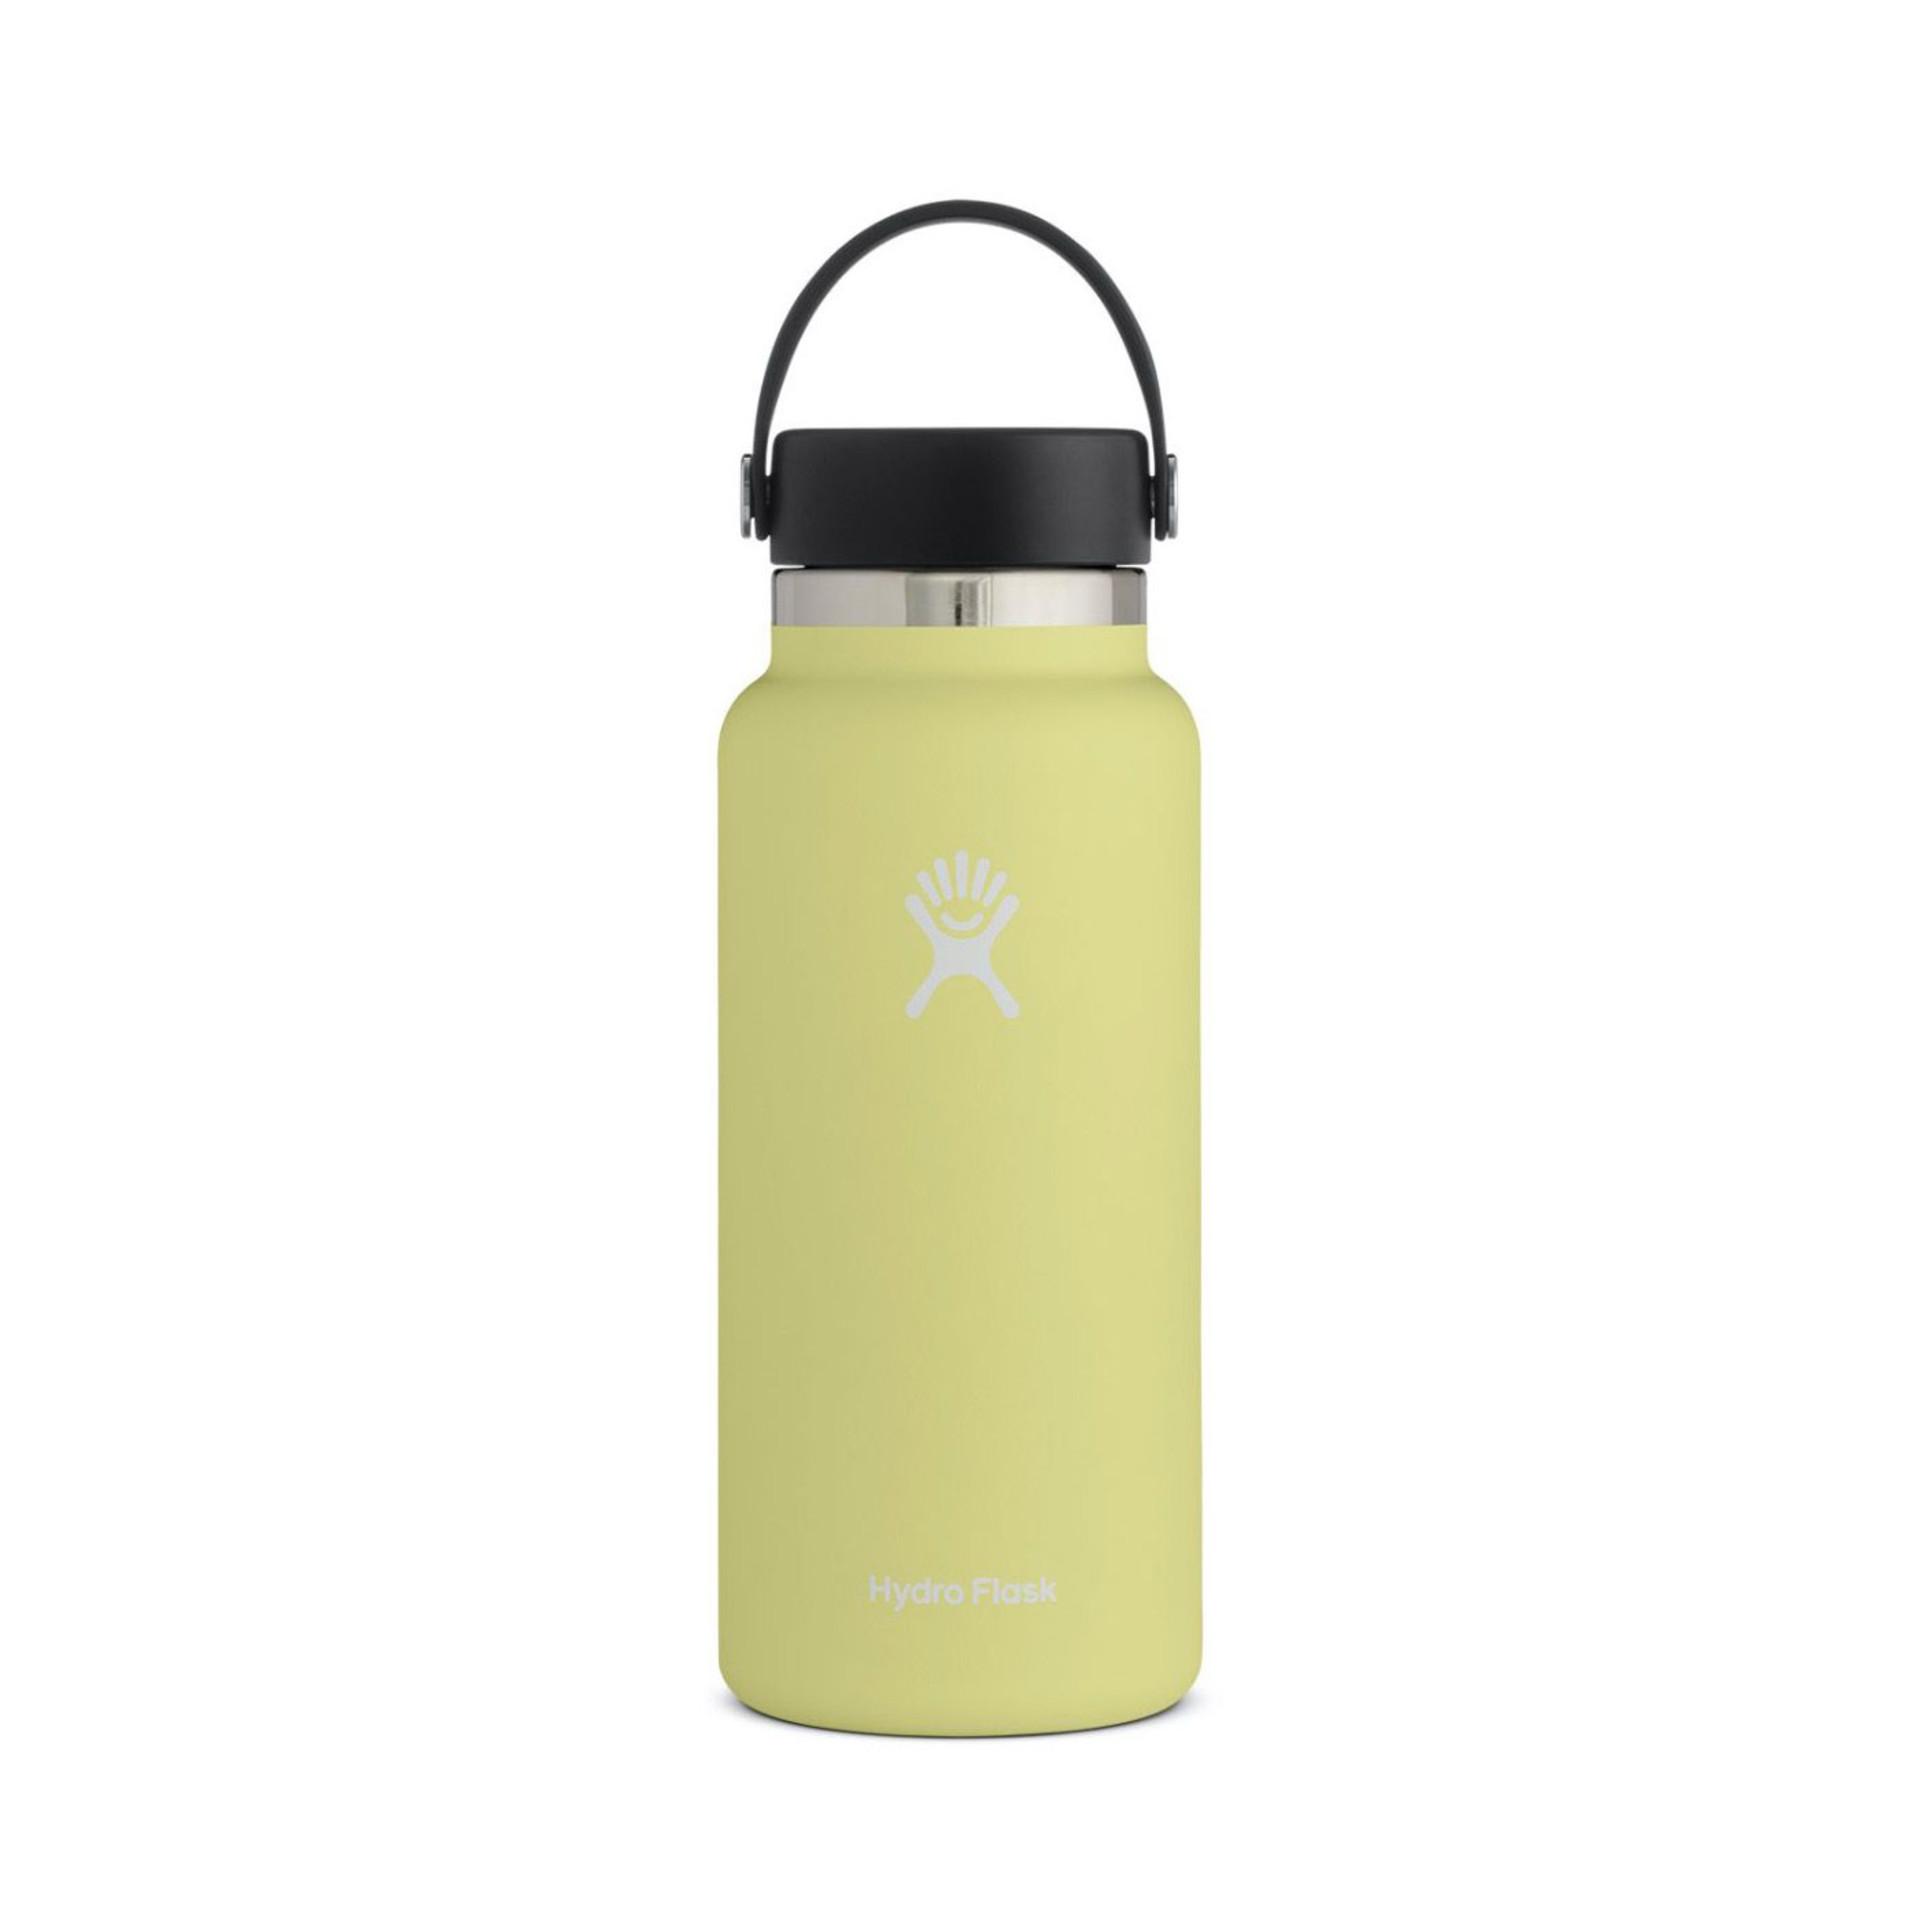 Hydro Flask Wide Mouth Water Bottle 32oz – Pineapple